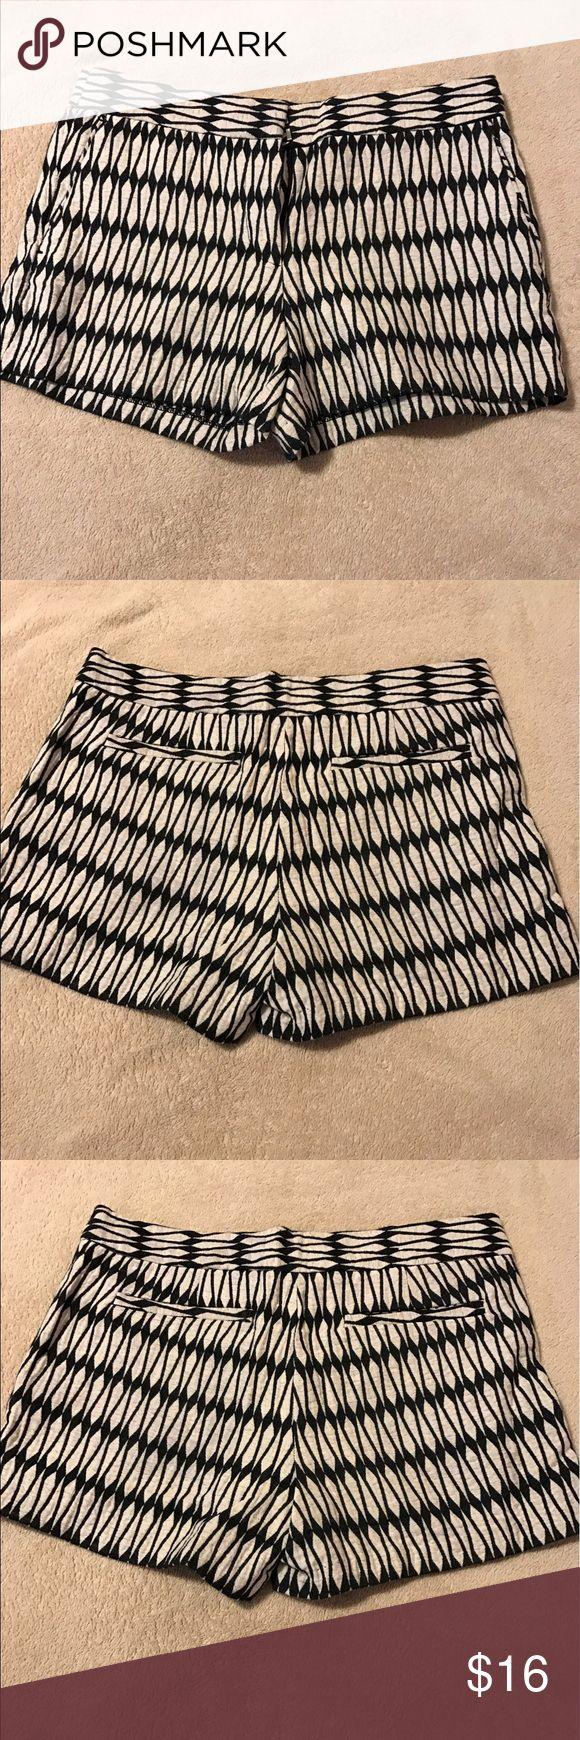 Joe Fresh Shorts Black & off-White shorts, loose fit throughout legs Joe Fresh Shorts